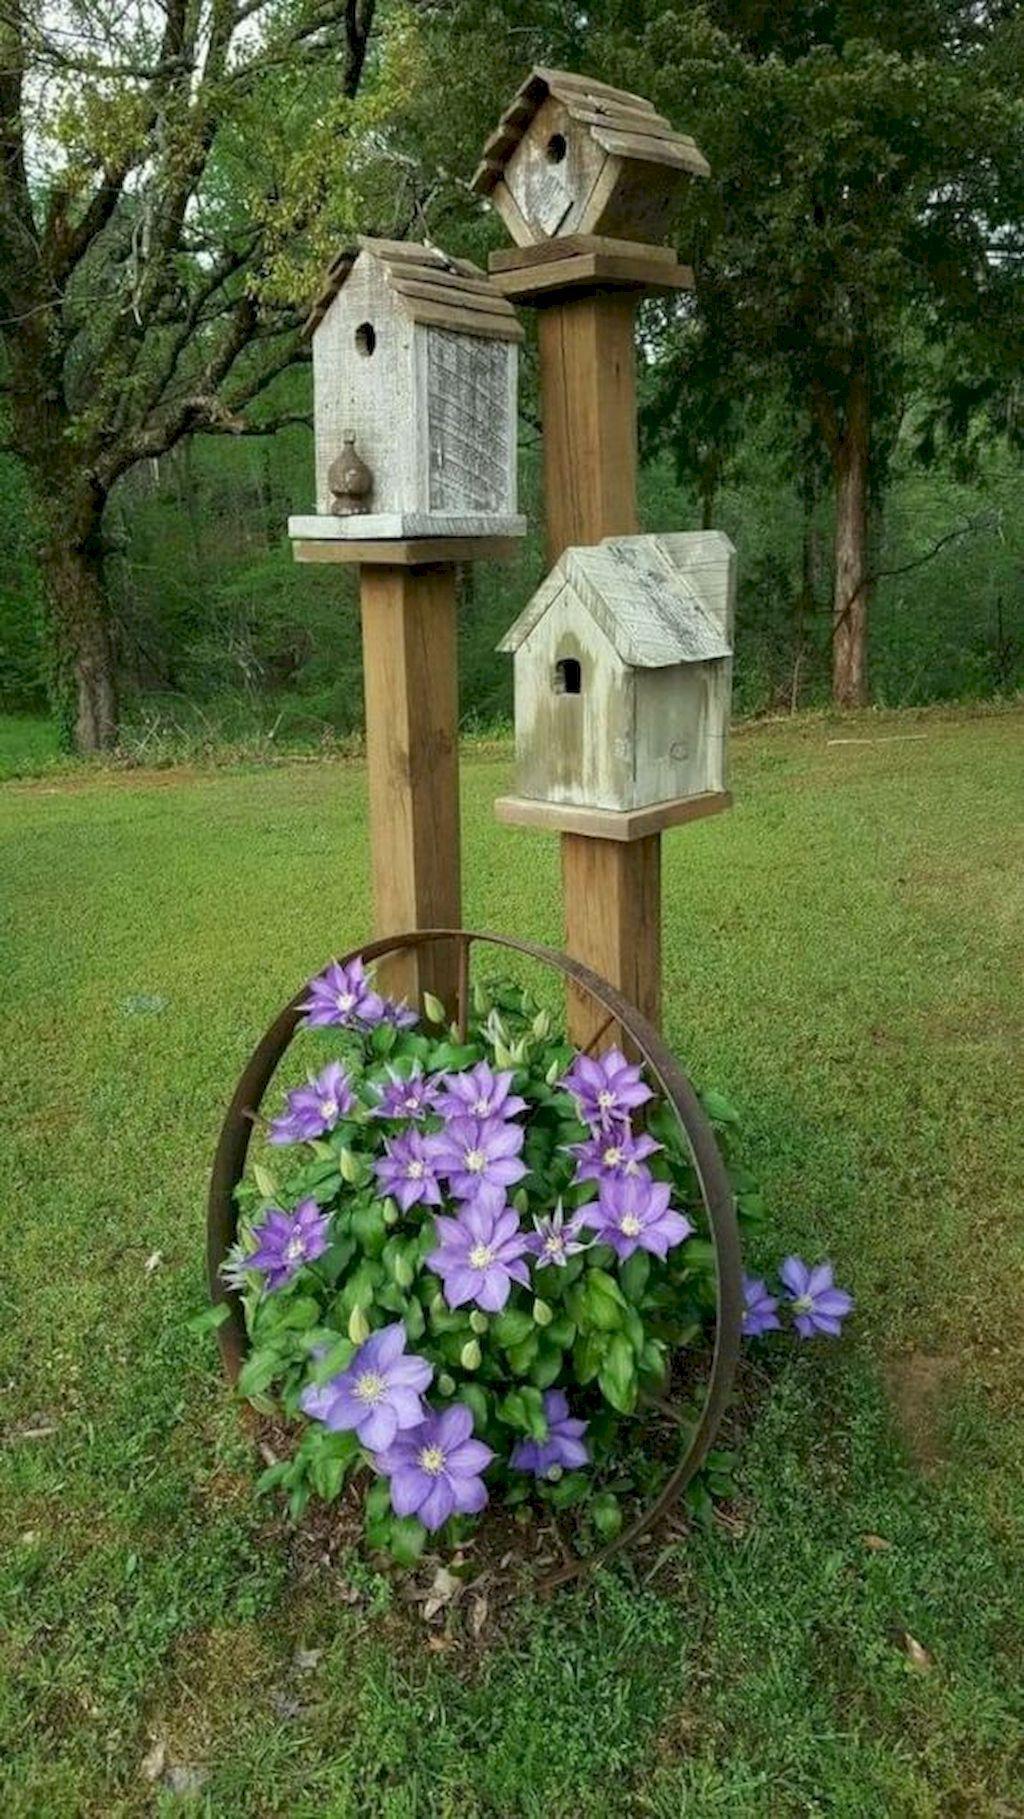 50 Stunning Spring Garden Ideas for Front Yard and Backyard Landscaping – Small front yard landscaping